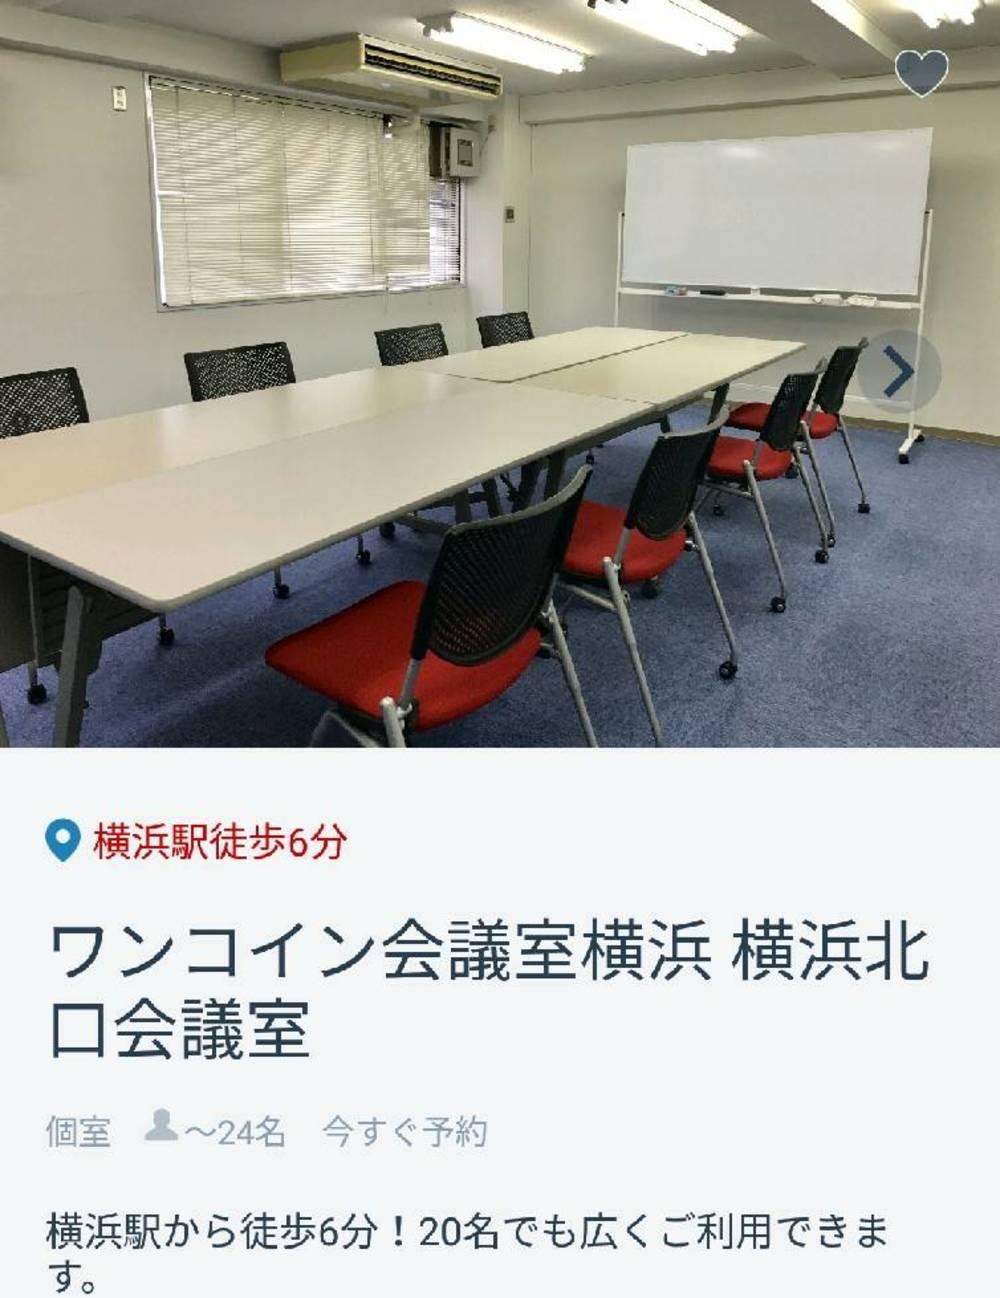 One coin English club at MTG room in 【Yokohama/横浜】 横浜駅徒歩8分.